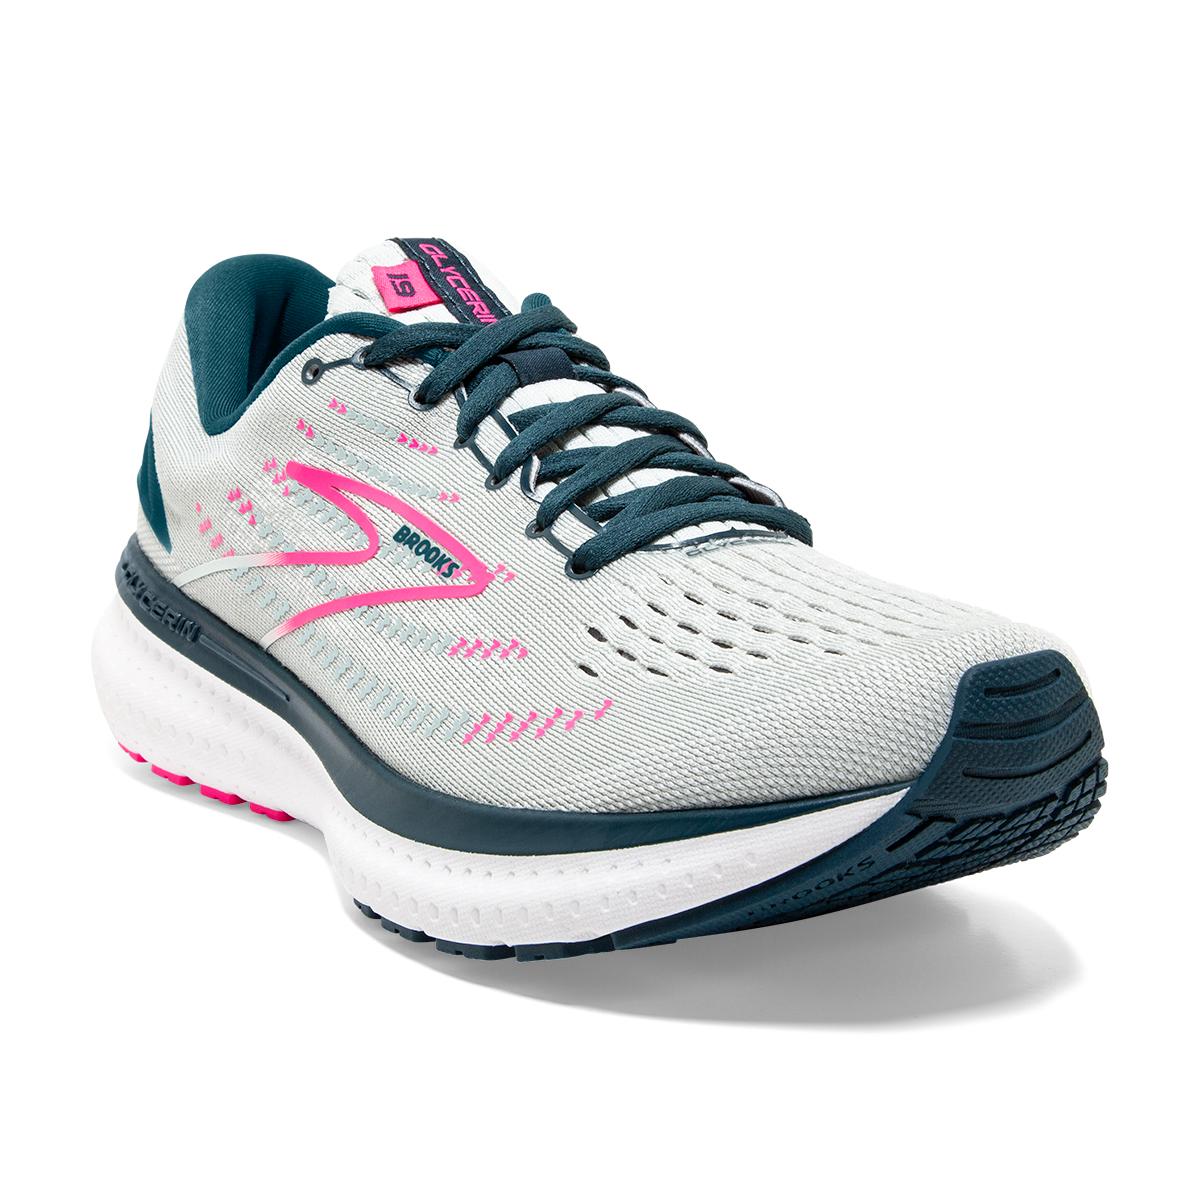 Women's Brooks Glycerin 19 Running Shoe - Color: Ice Flow/Navy - Size: 5 - Width: Regular, Ice Flow/Navy, large, image 4